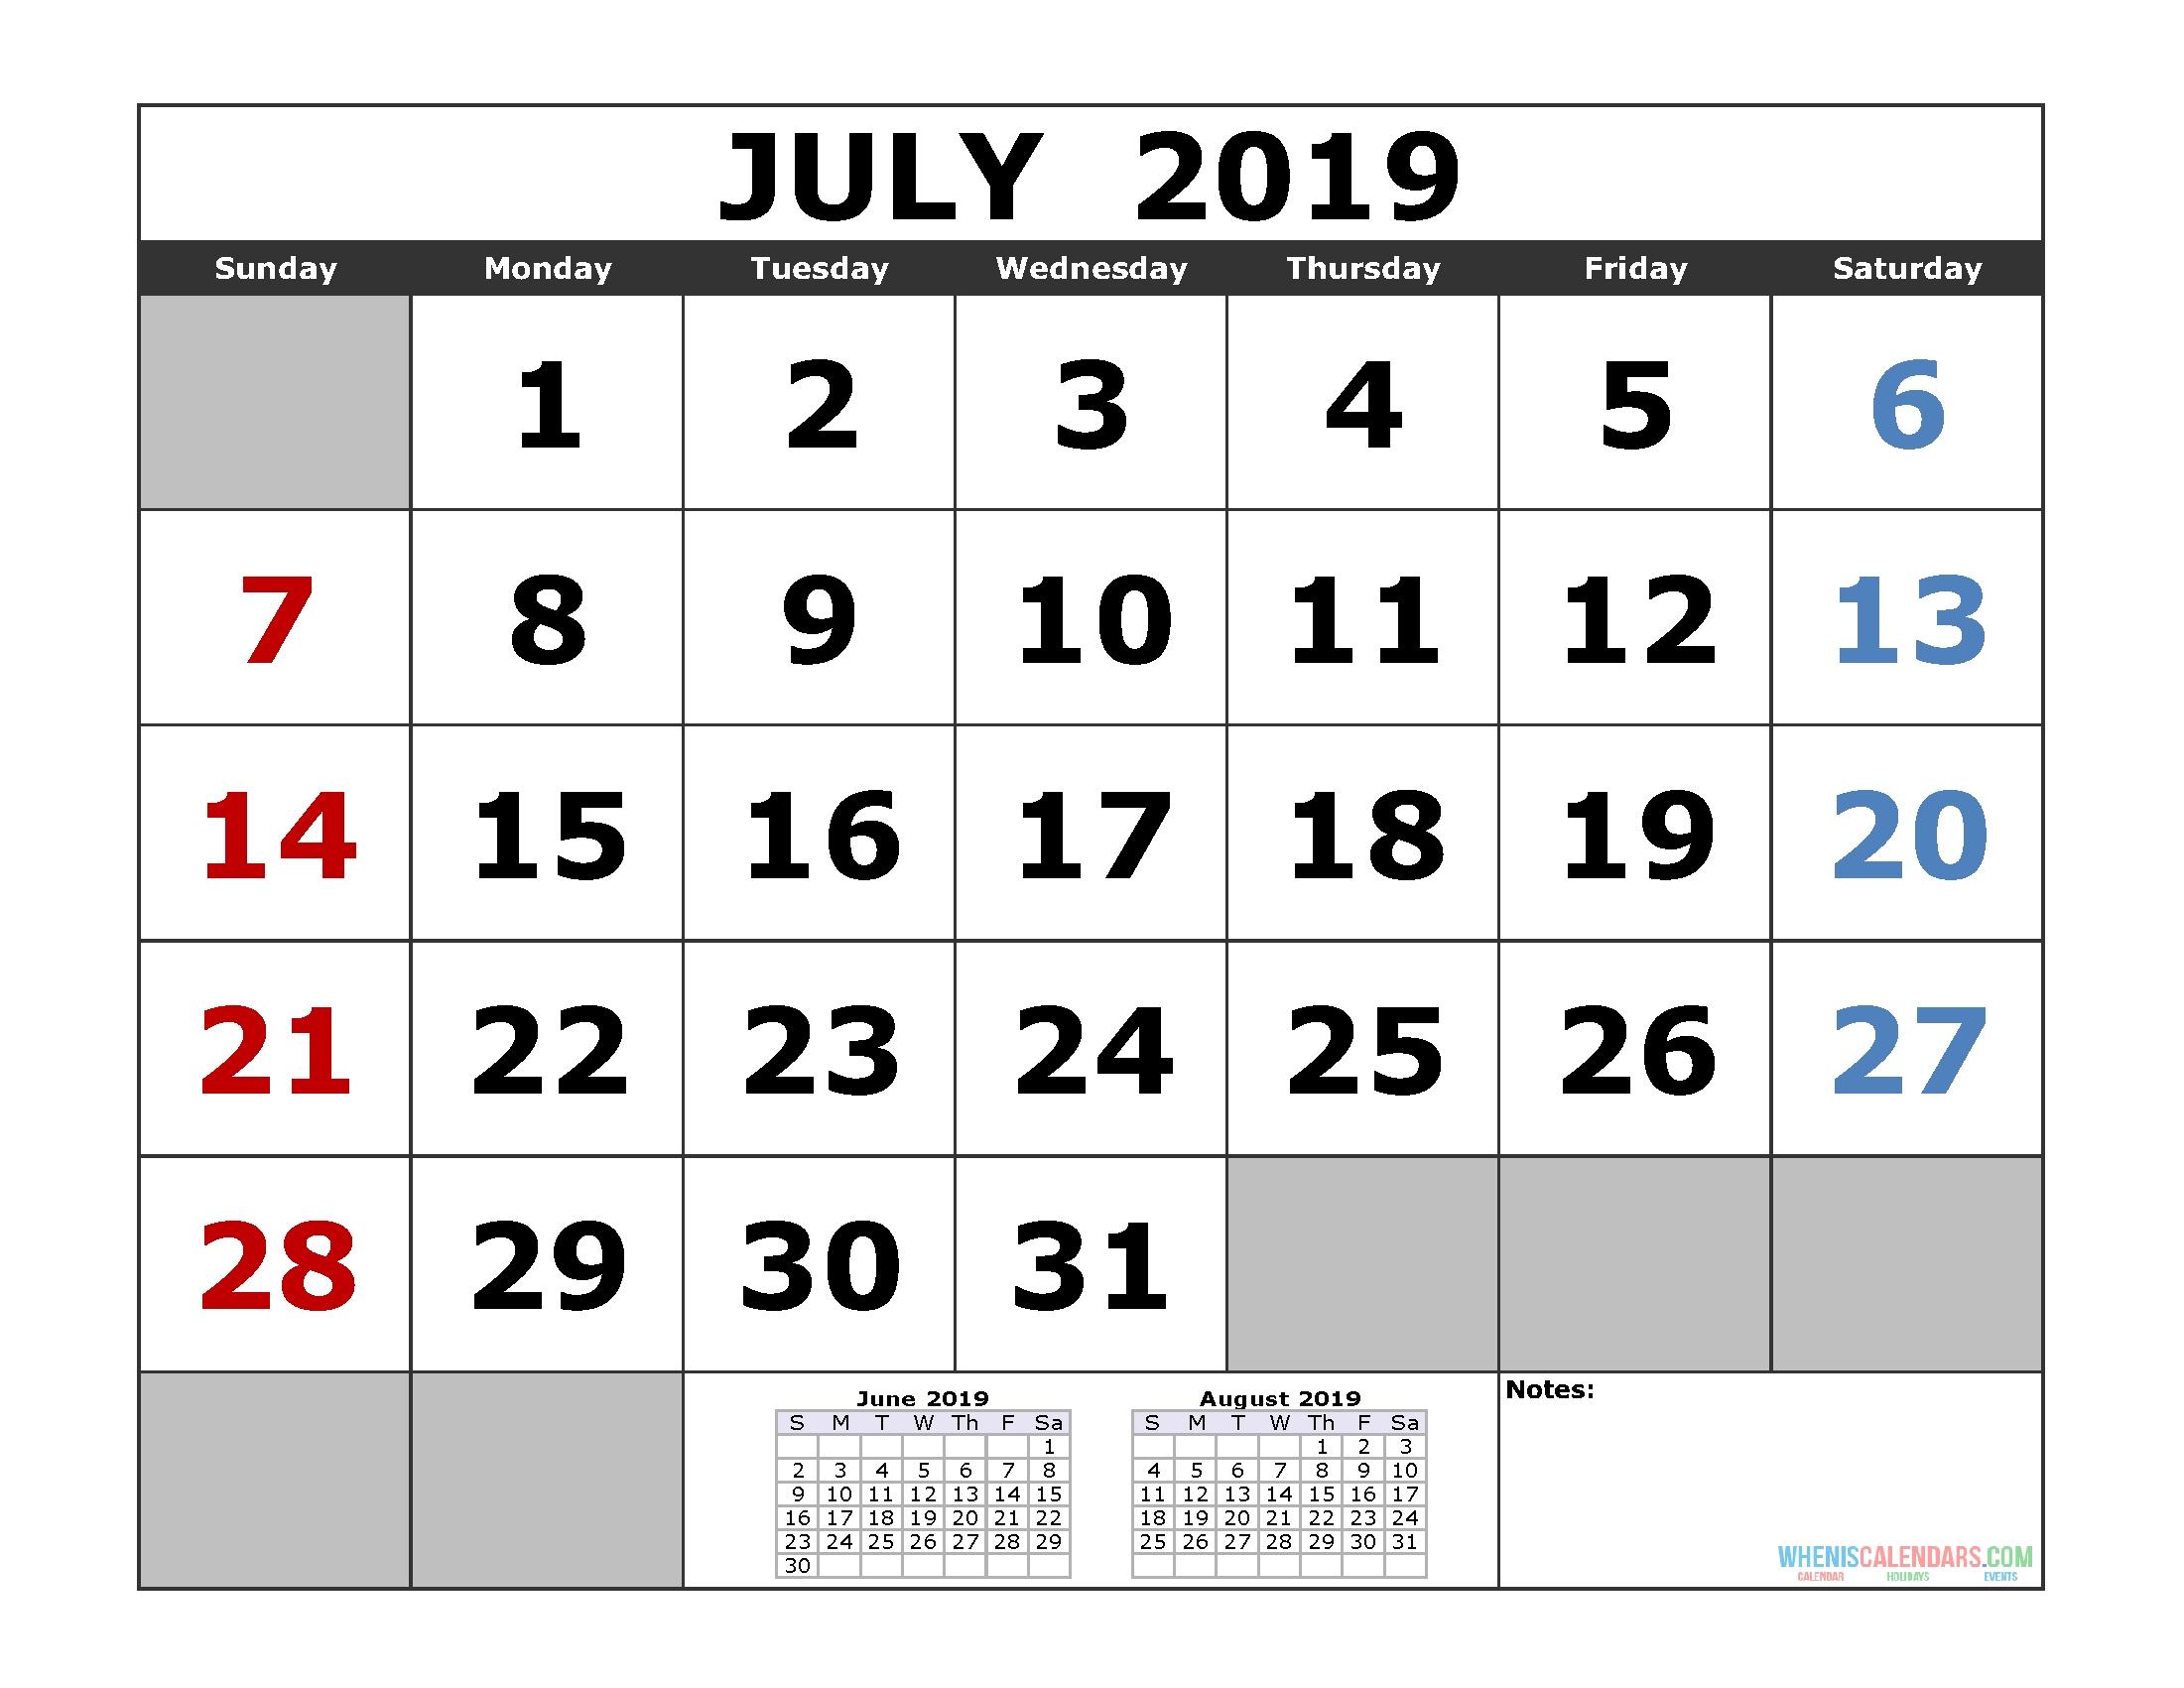 July 2019 Printable Calendar Template (3 Month Calendar-Blank Calendar Printable Three Months Togather